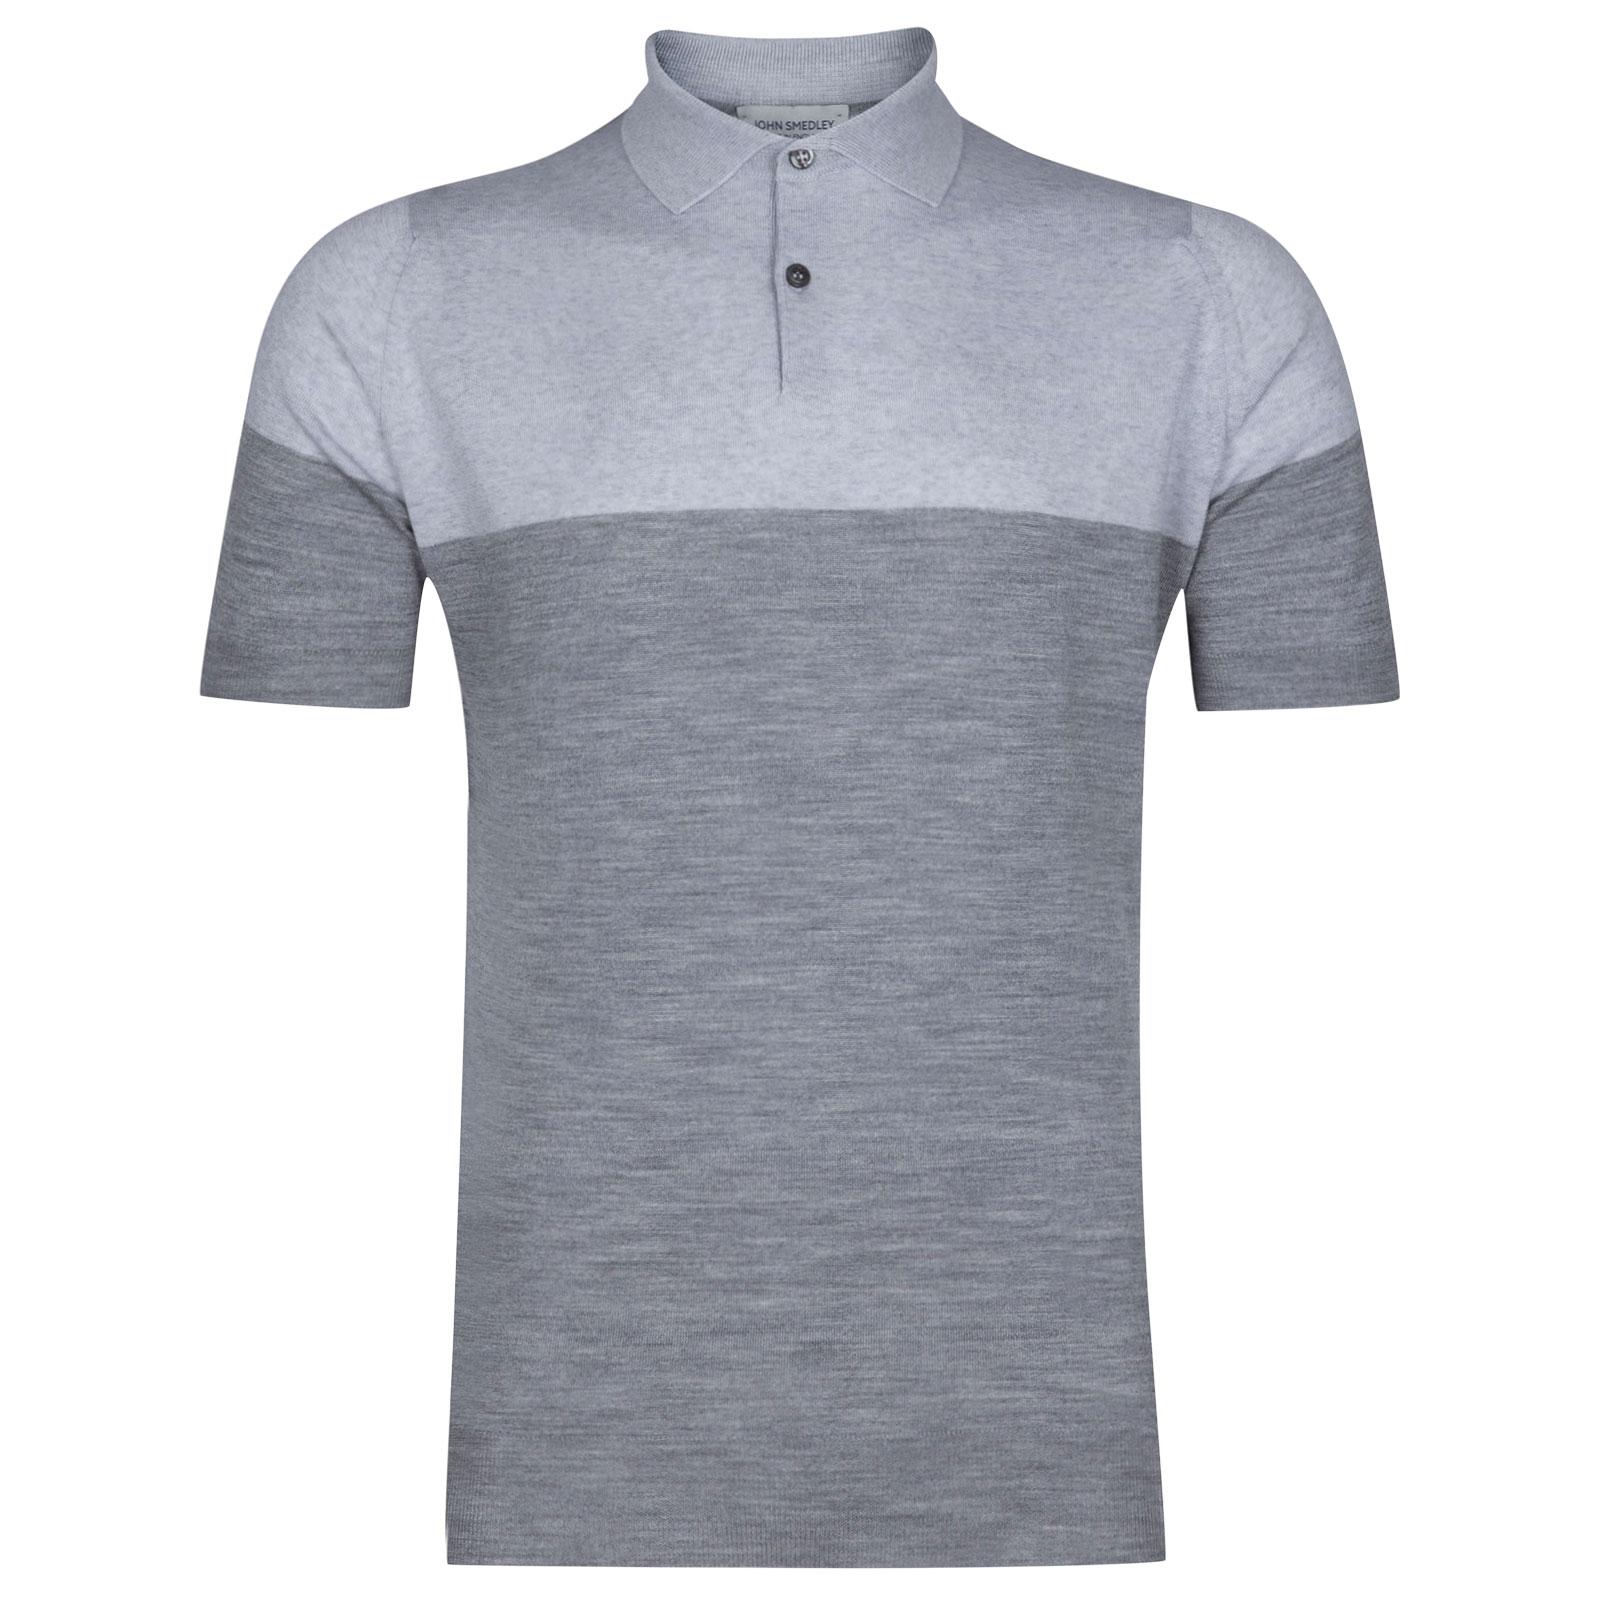 John Smedley Toller Extra Fine Merino Wool Shirt in Silver-XL